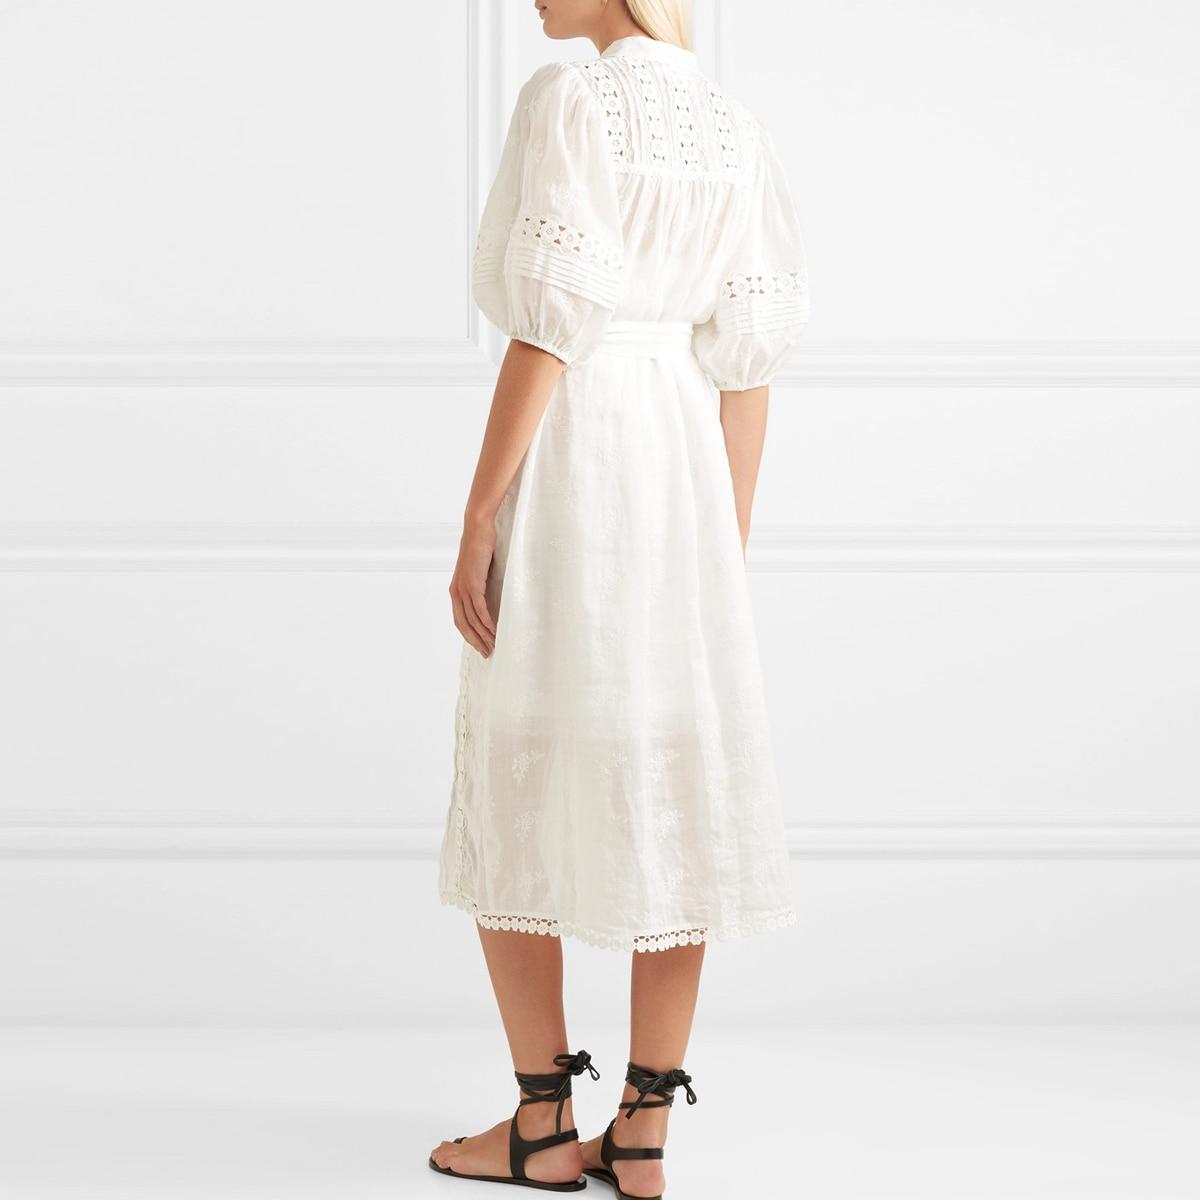 Jastie 2018 Spring Autumn Women Dress Crochet Floral Embroidered Midi Dress Tie Belt Waist Casual Boho Hippie Casual Dresses